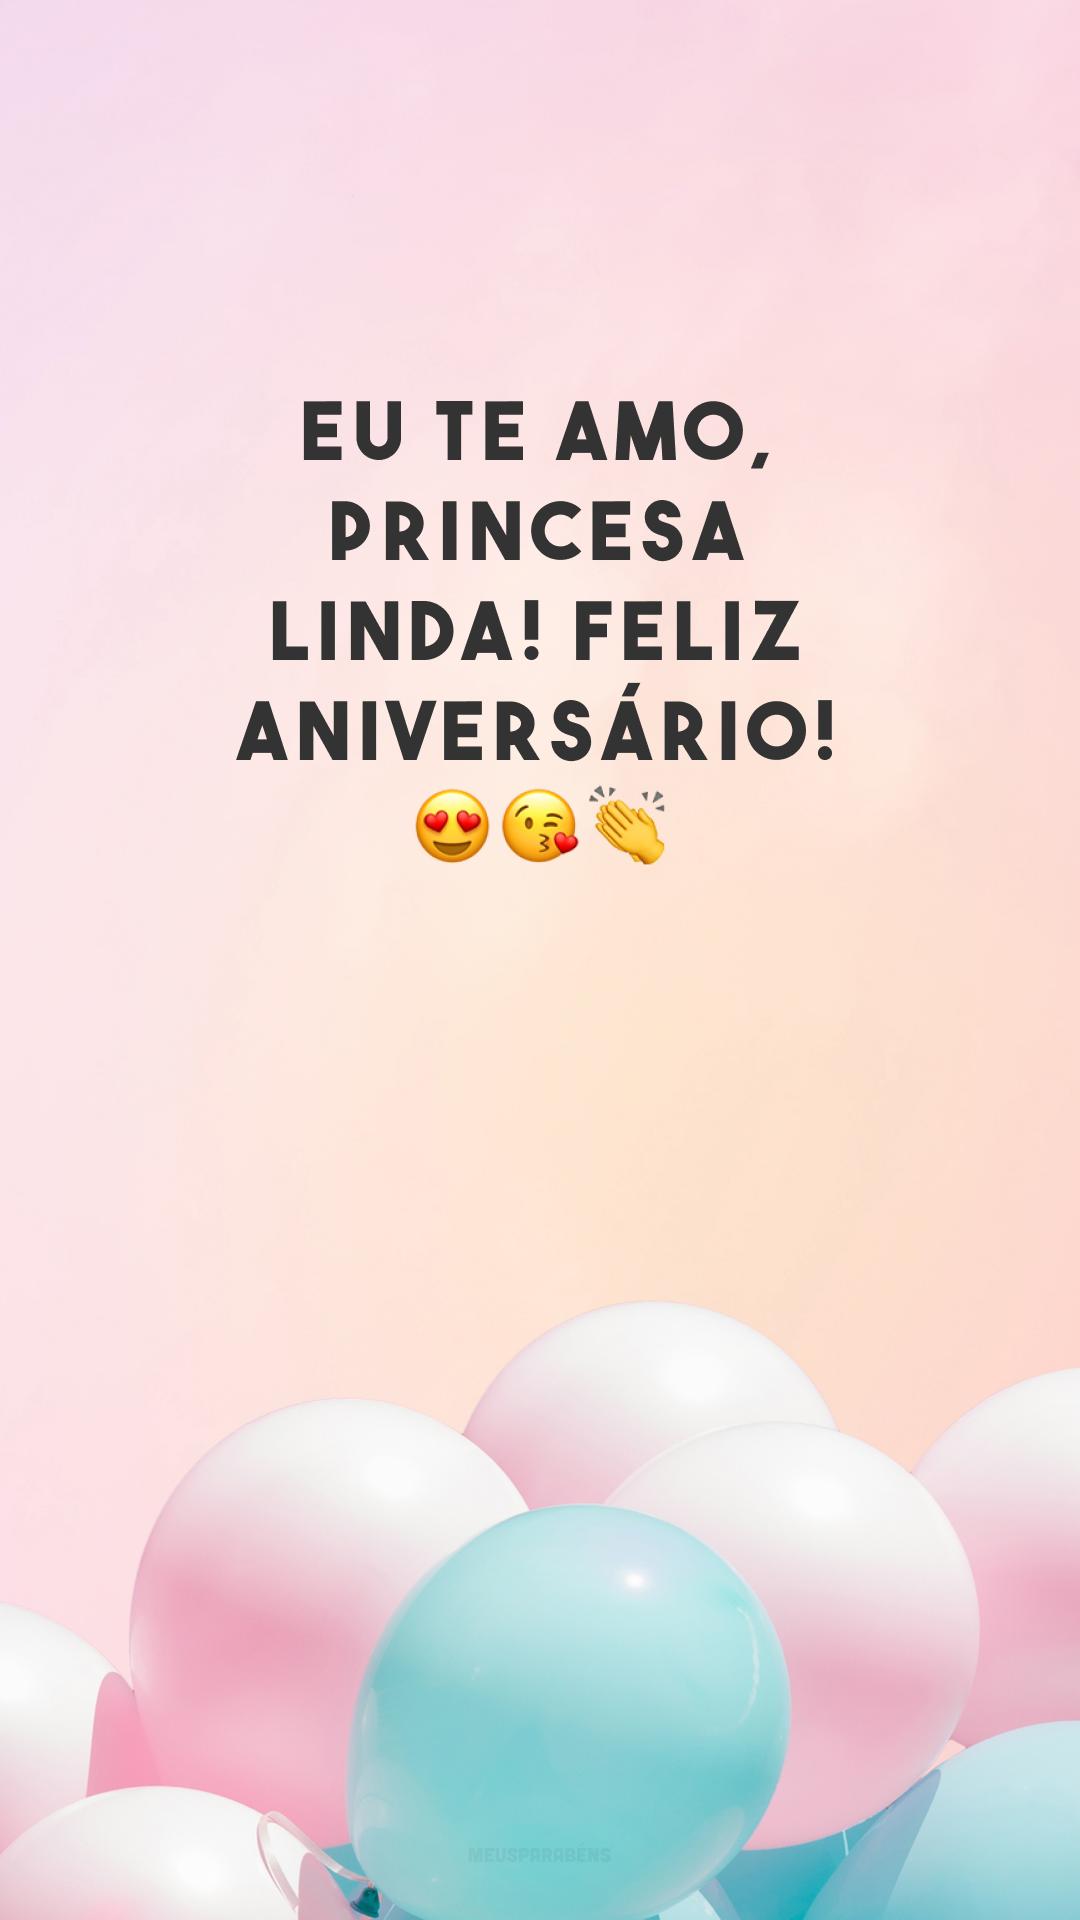 Eu te amo, princesa linda! Feliz aniversário! 😍😘👏